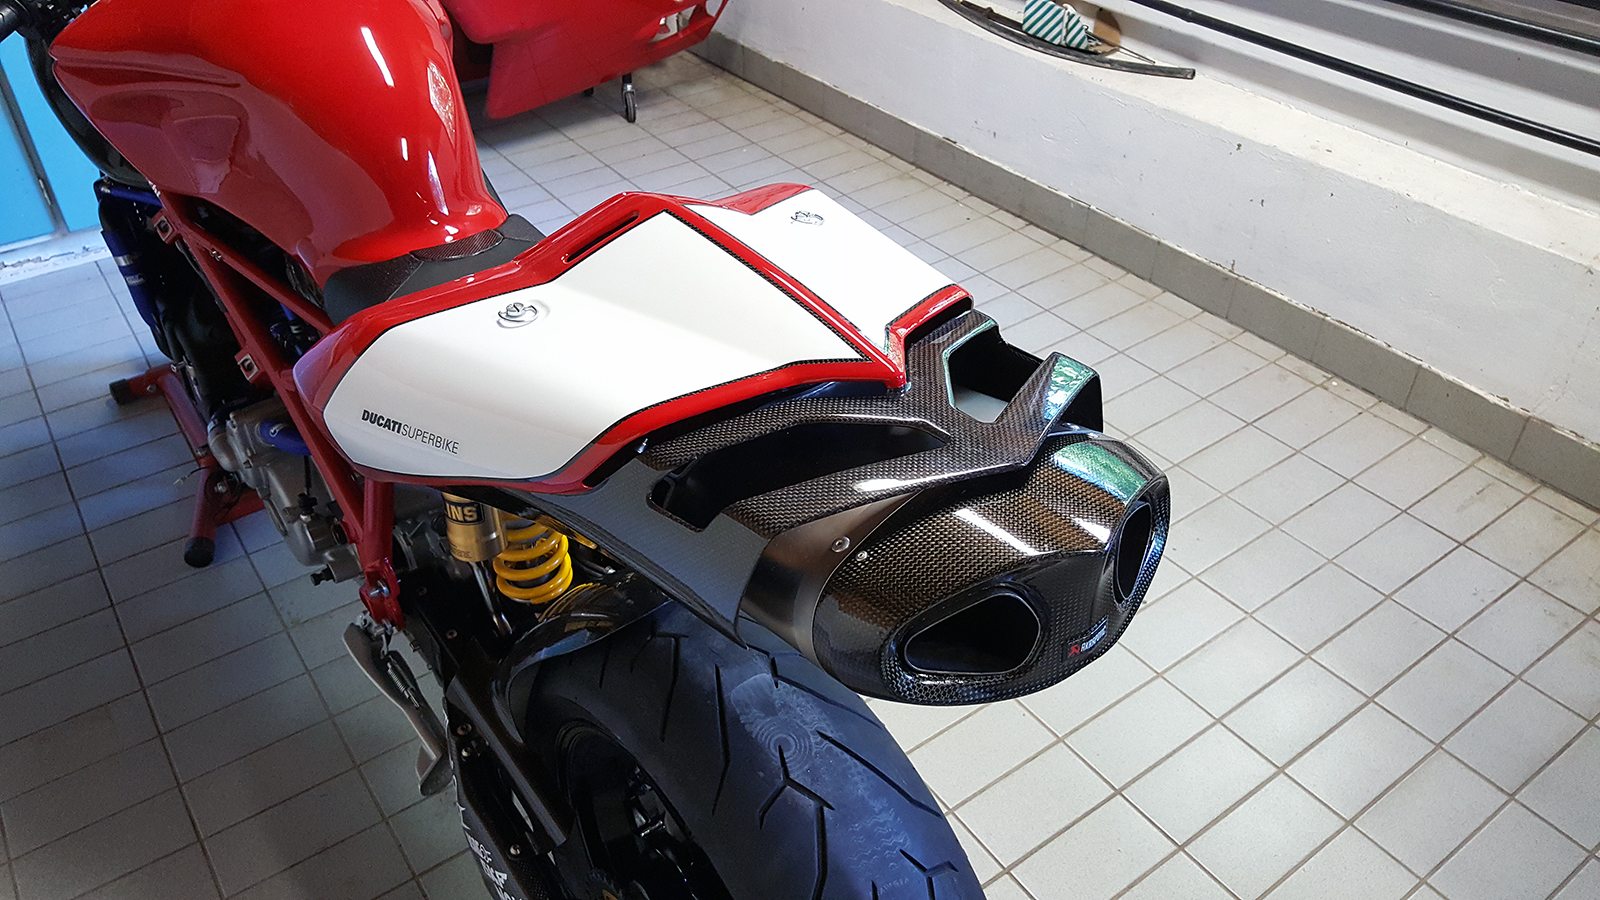 999 Nrc Tail Tidy Install Instructions Ducati Forum 2005 749 Wiring Harness 20170714 204854